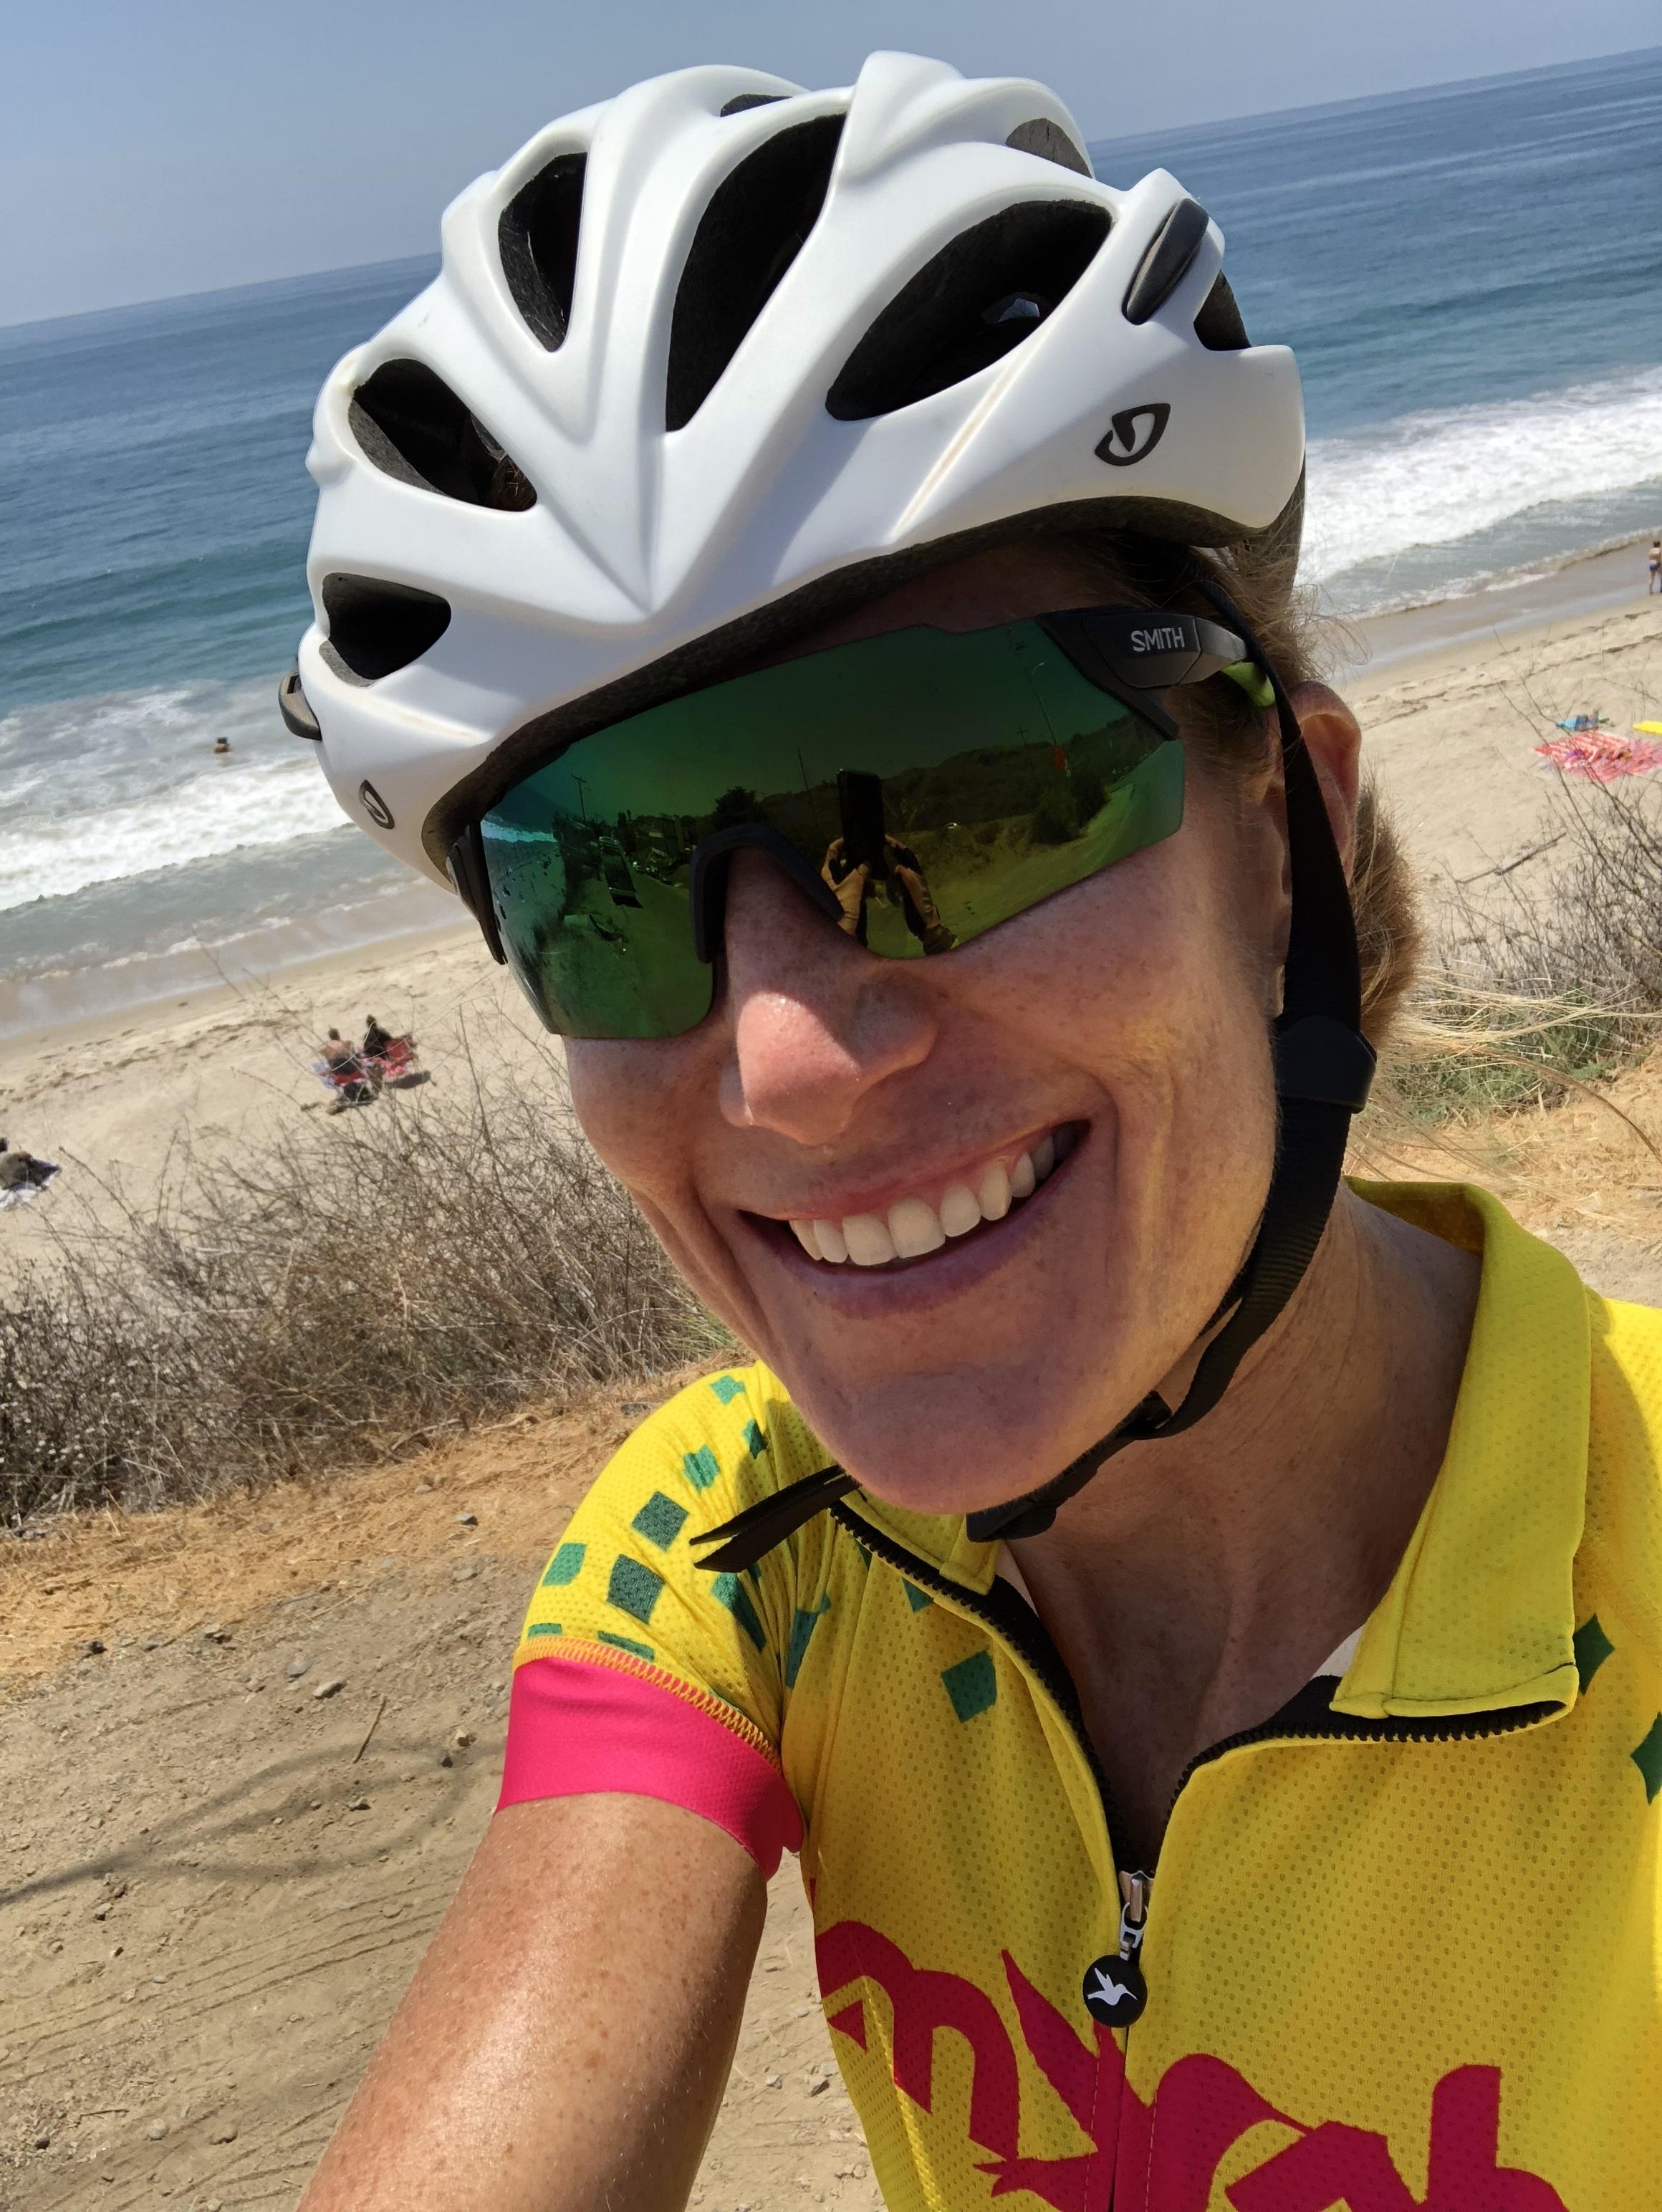 Ninety miles into a 101 mile bike ride along PCH.